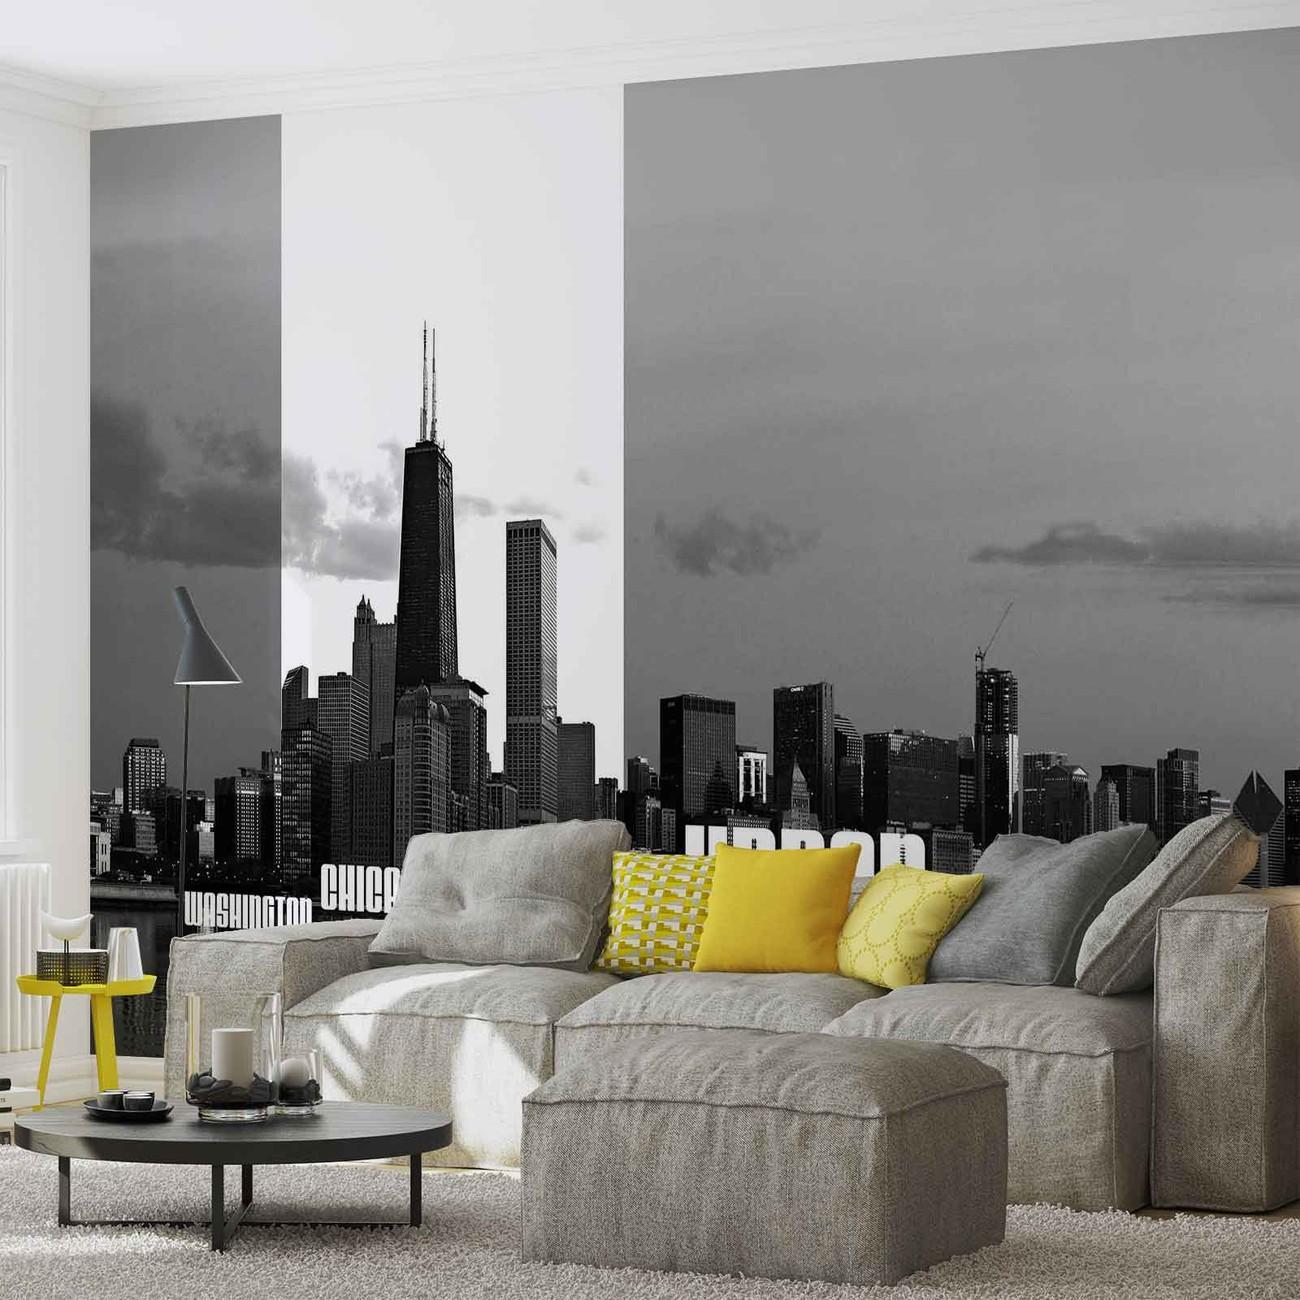 fototapete tapete st dte skyline bei europosters. Black Bedroom Furniture Sets. Home Design Ideas